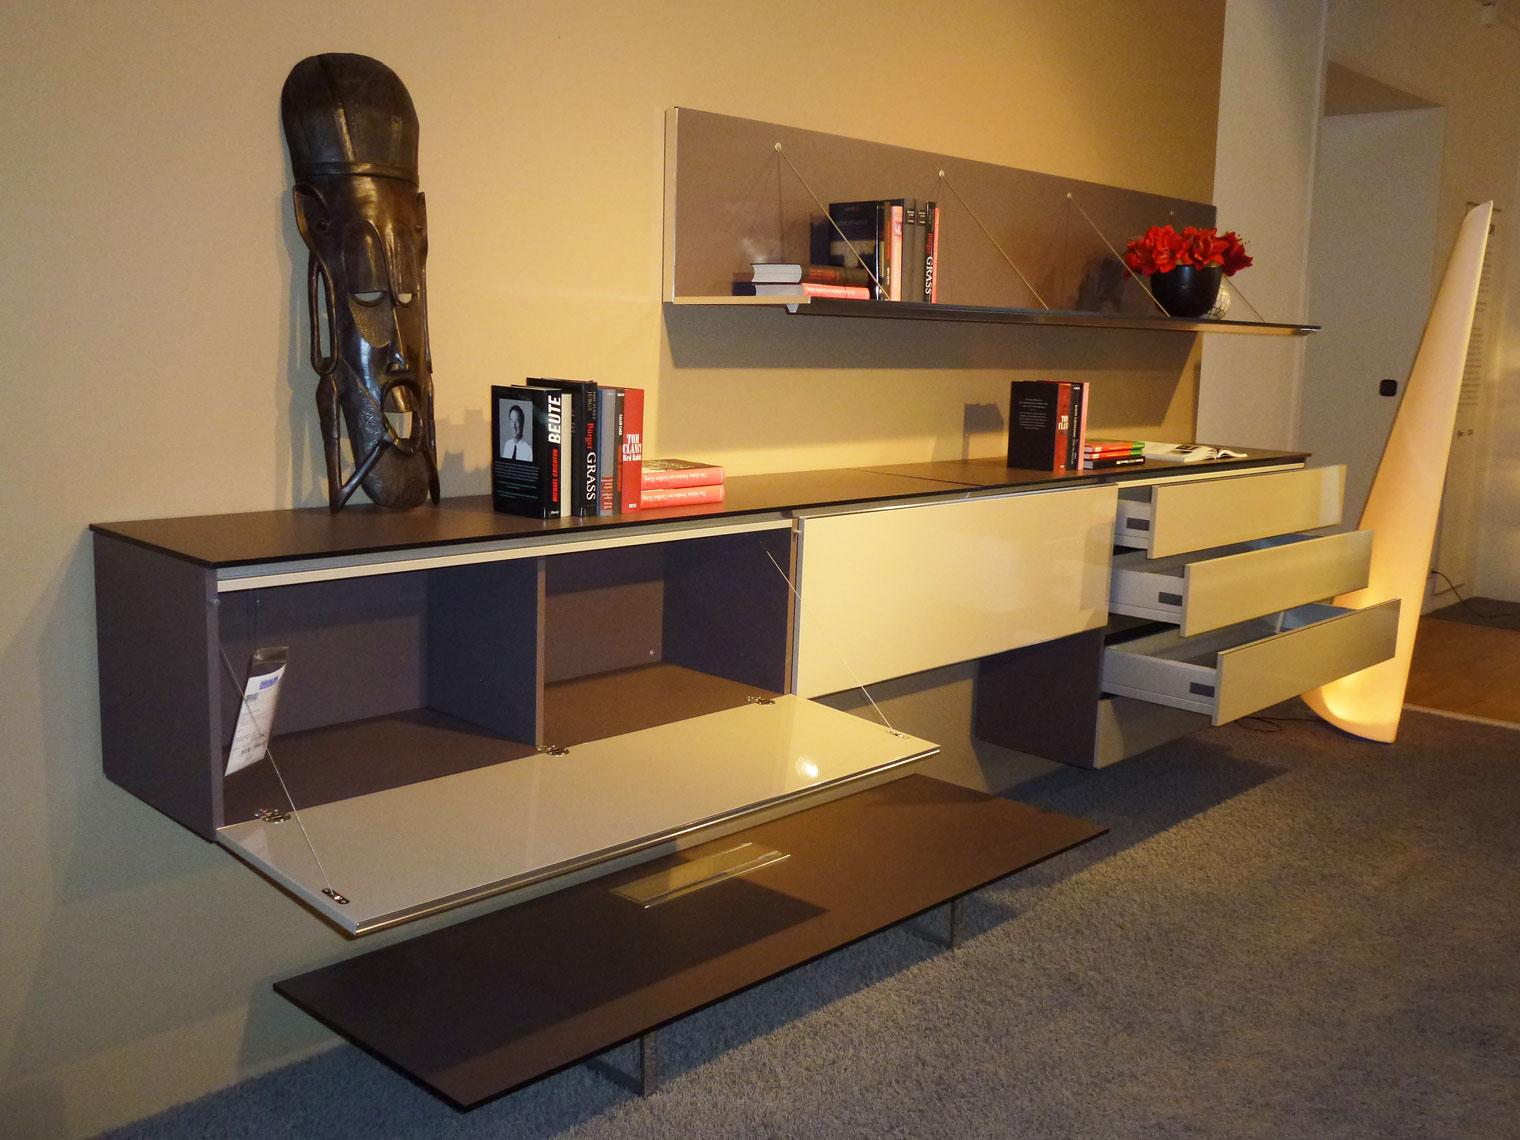 b b italia pab kommodensystem2 m bel braum. Black Bedroom Furniture Sets. Home Design Ideas